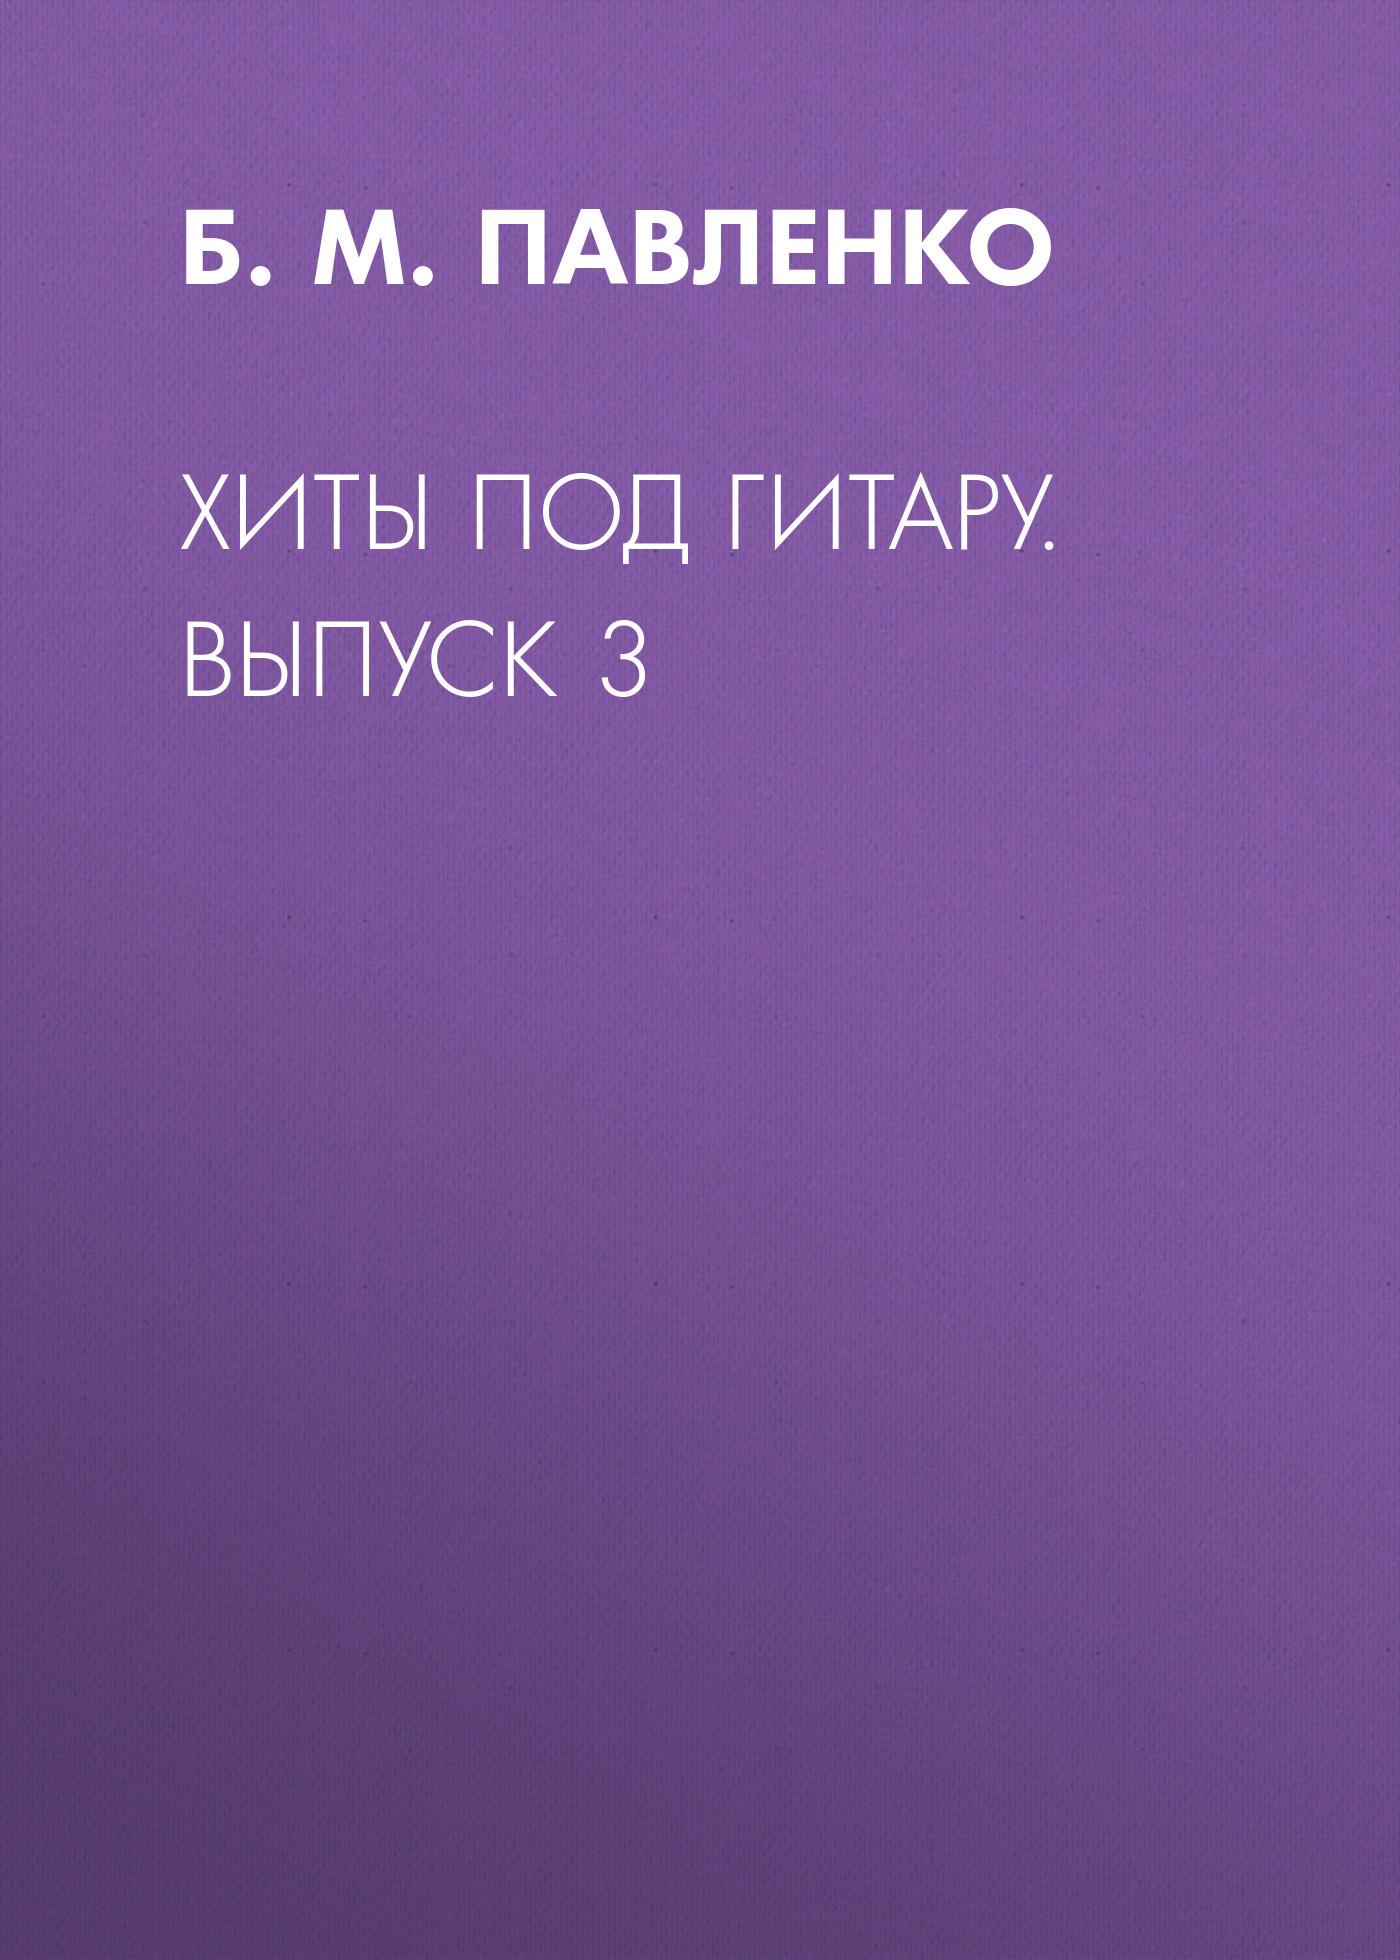 Б. М. Павленко Хиты под гитару. Выпуск 3 б м павленко хиты под гитару выпуск 1